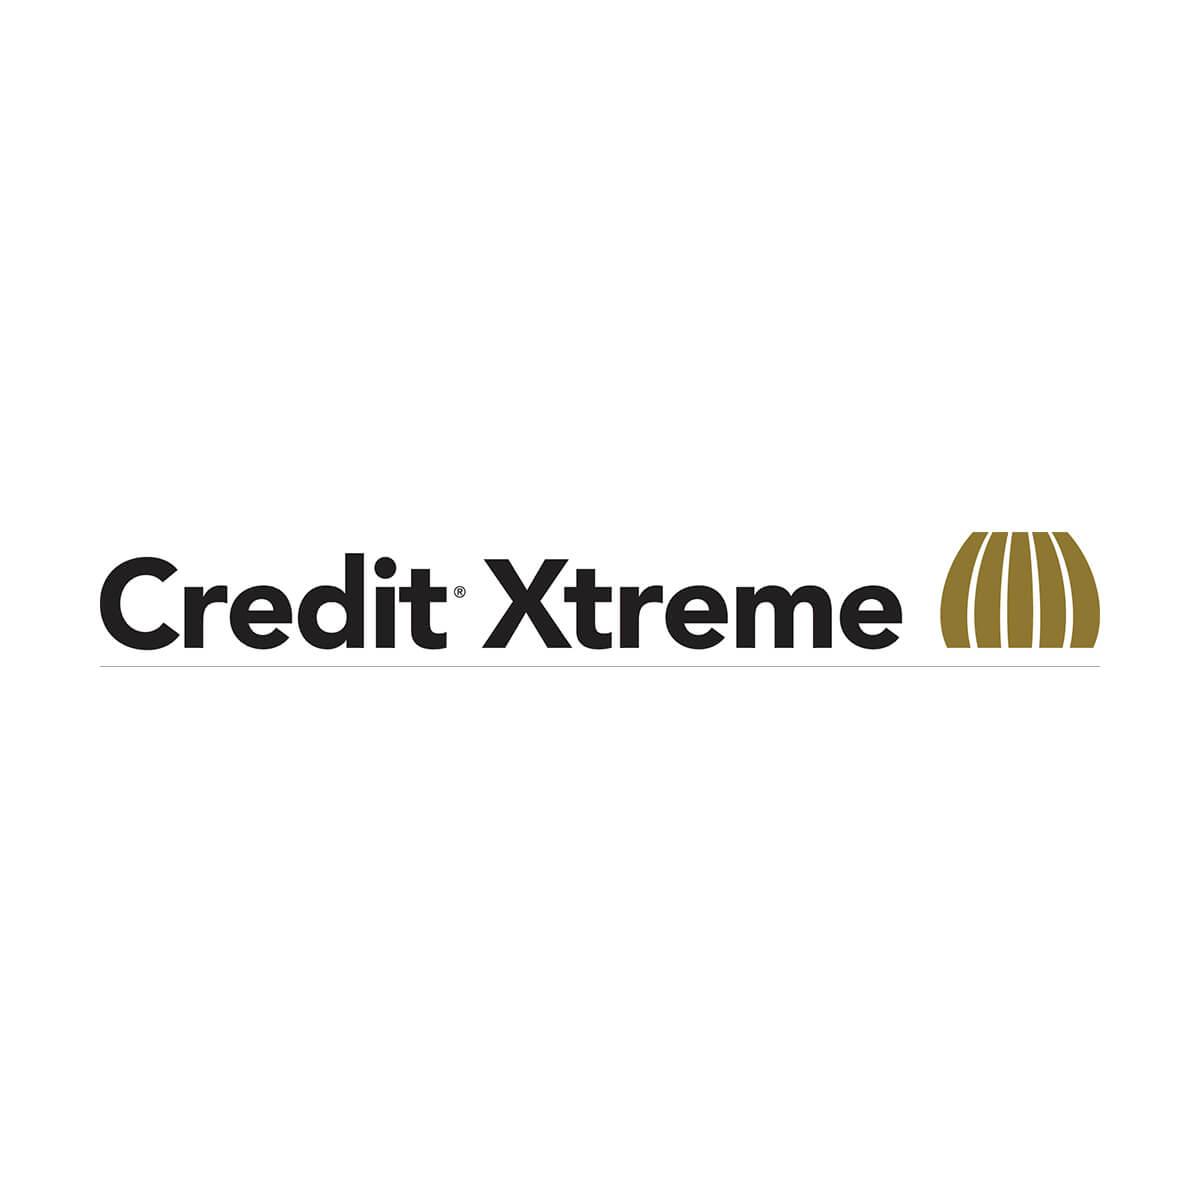 Credit® Xtreme - 900 L Tote